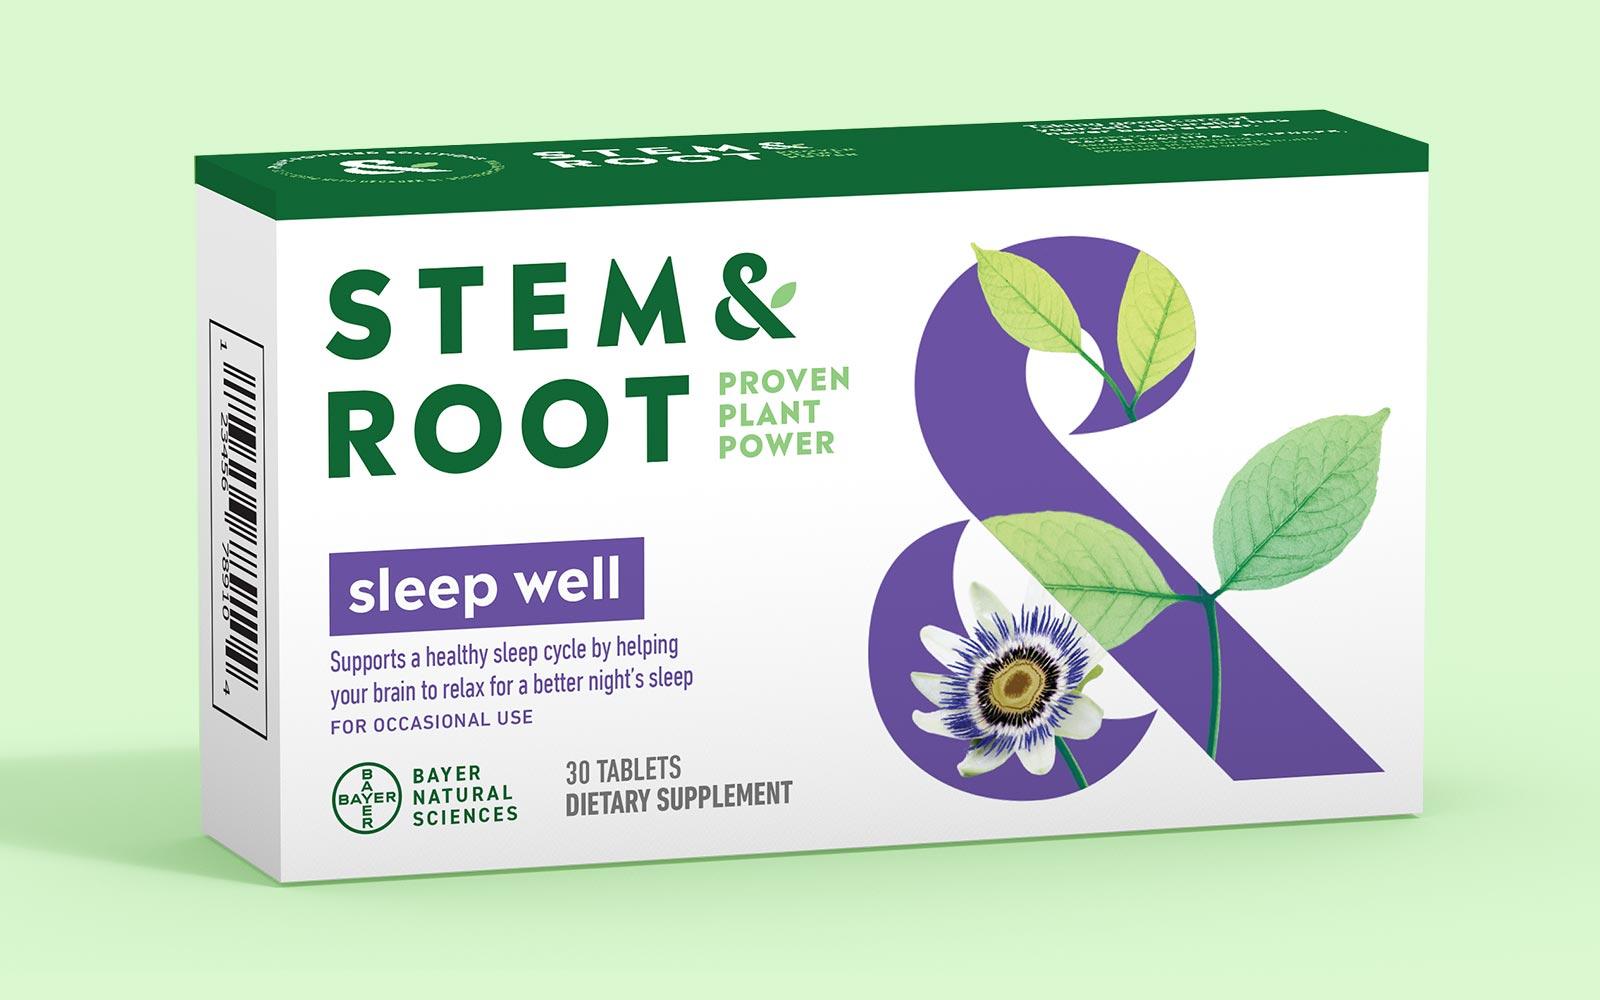 Stem & Root